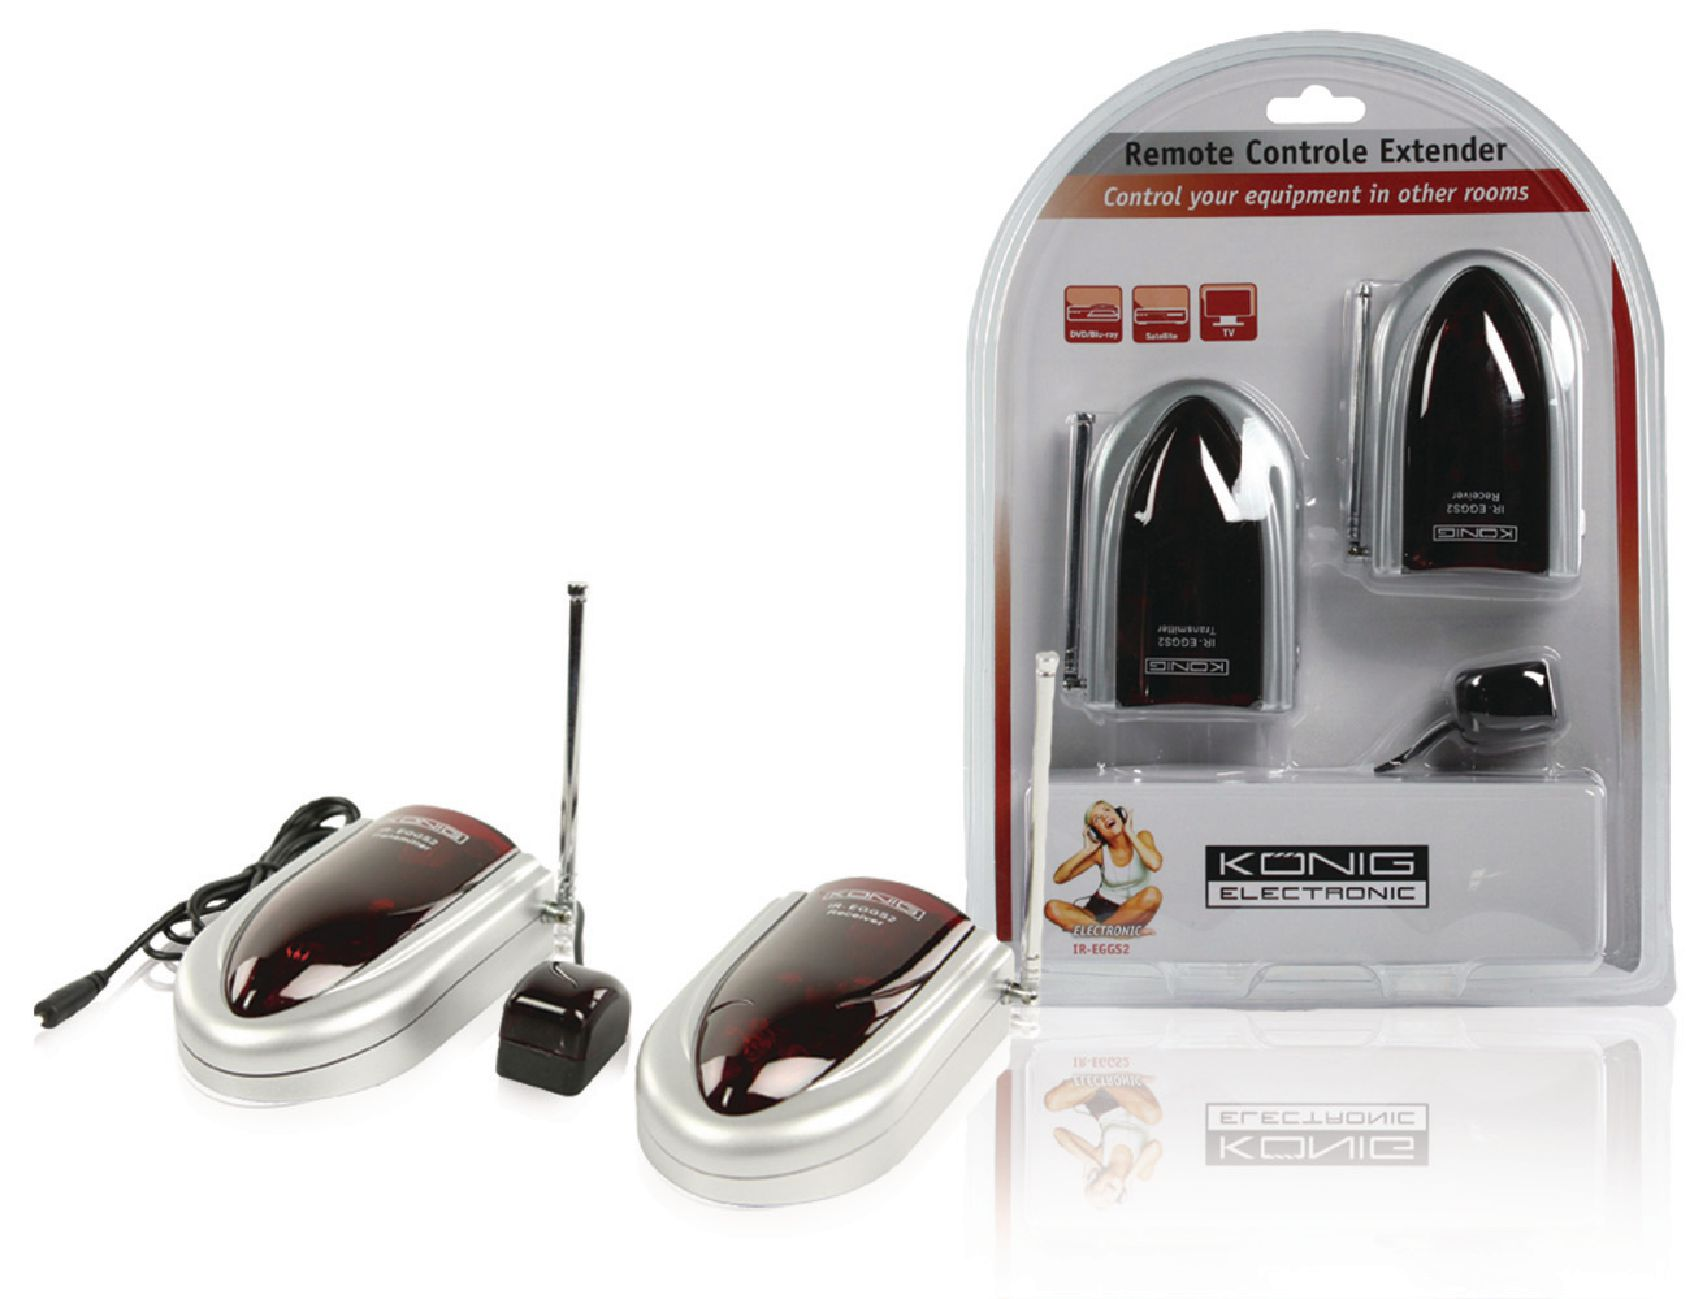 Ir Eggs2 Knig Remote Control Extender 43392 Mhz Range 35 M